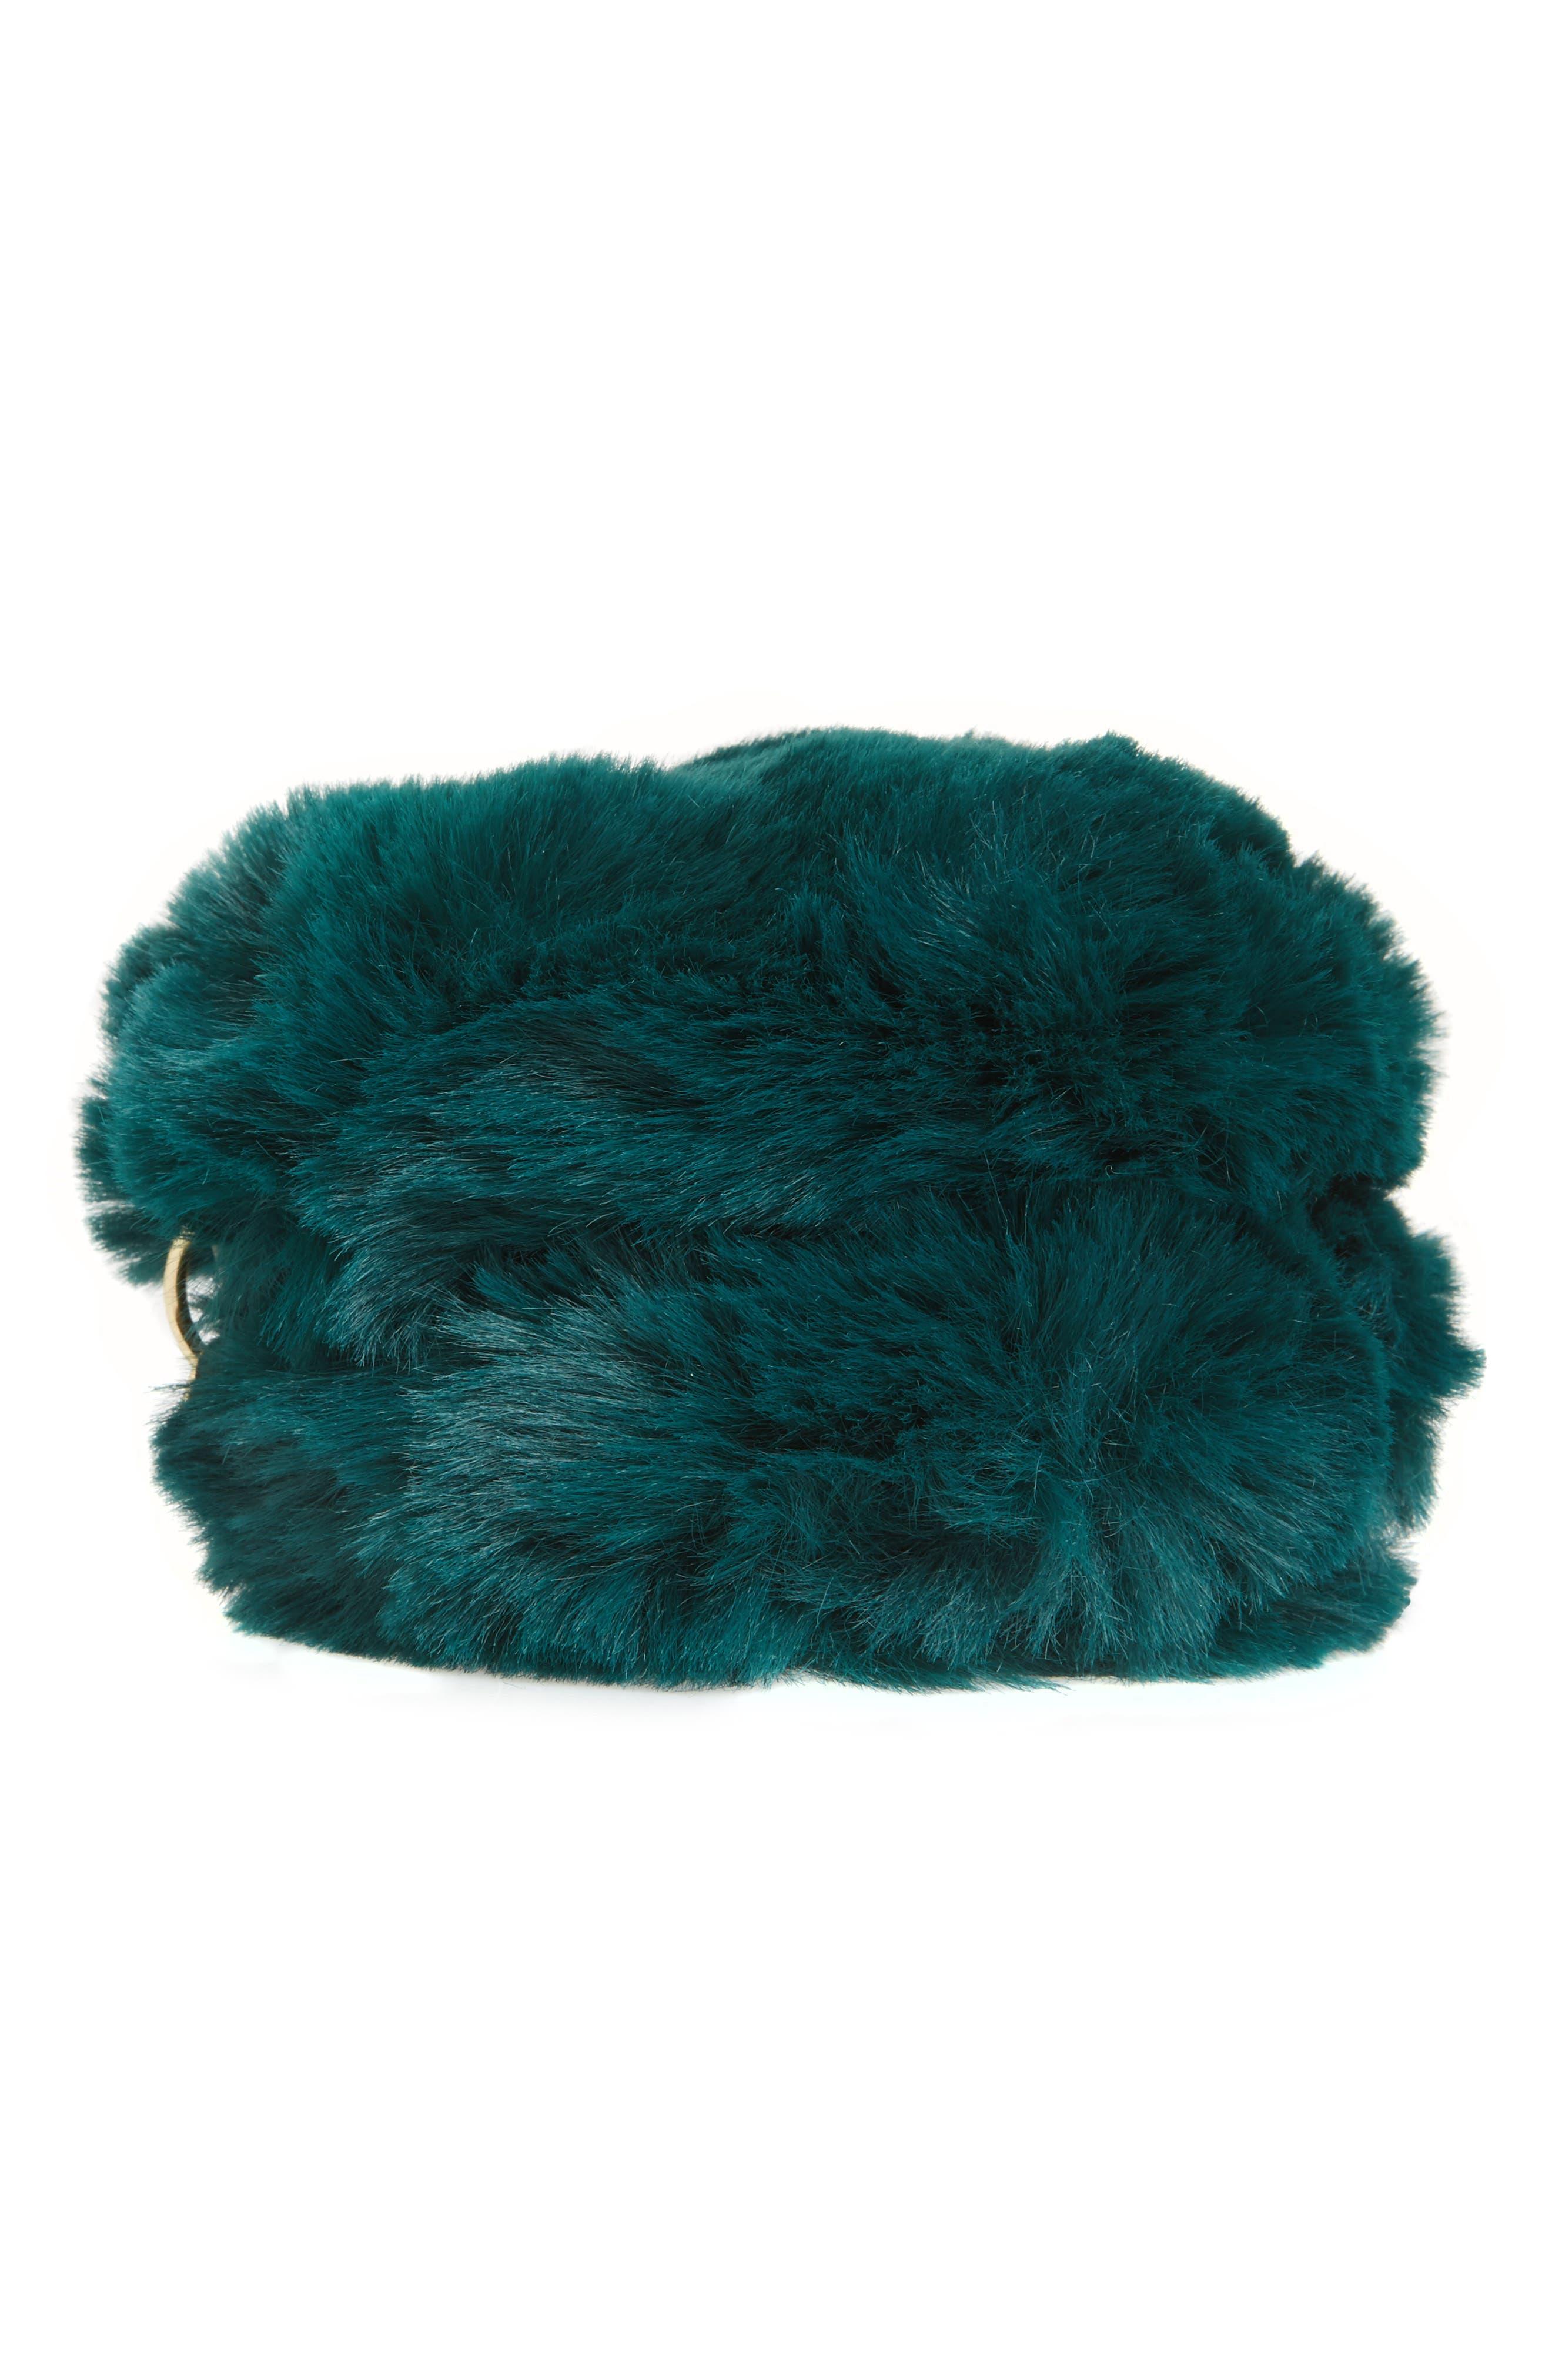 Macaron Faux Fur Wristlet,                             Alternate thumbnail 6, color,                             300